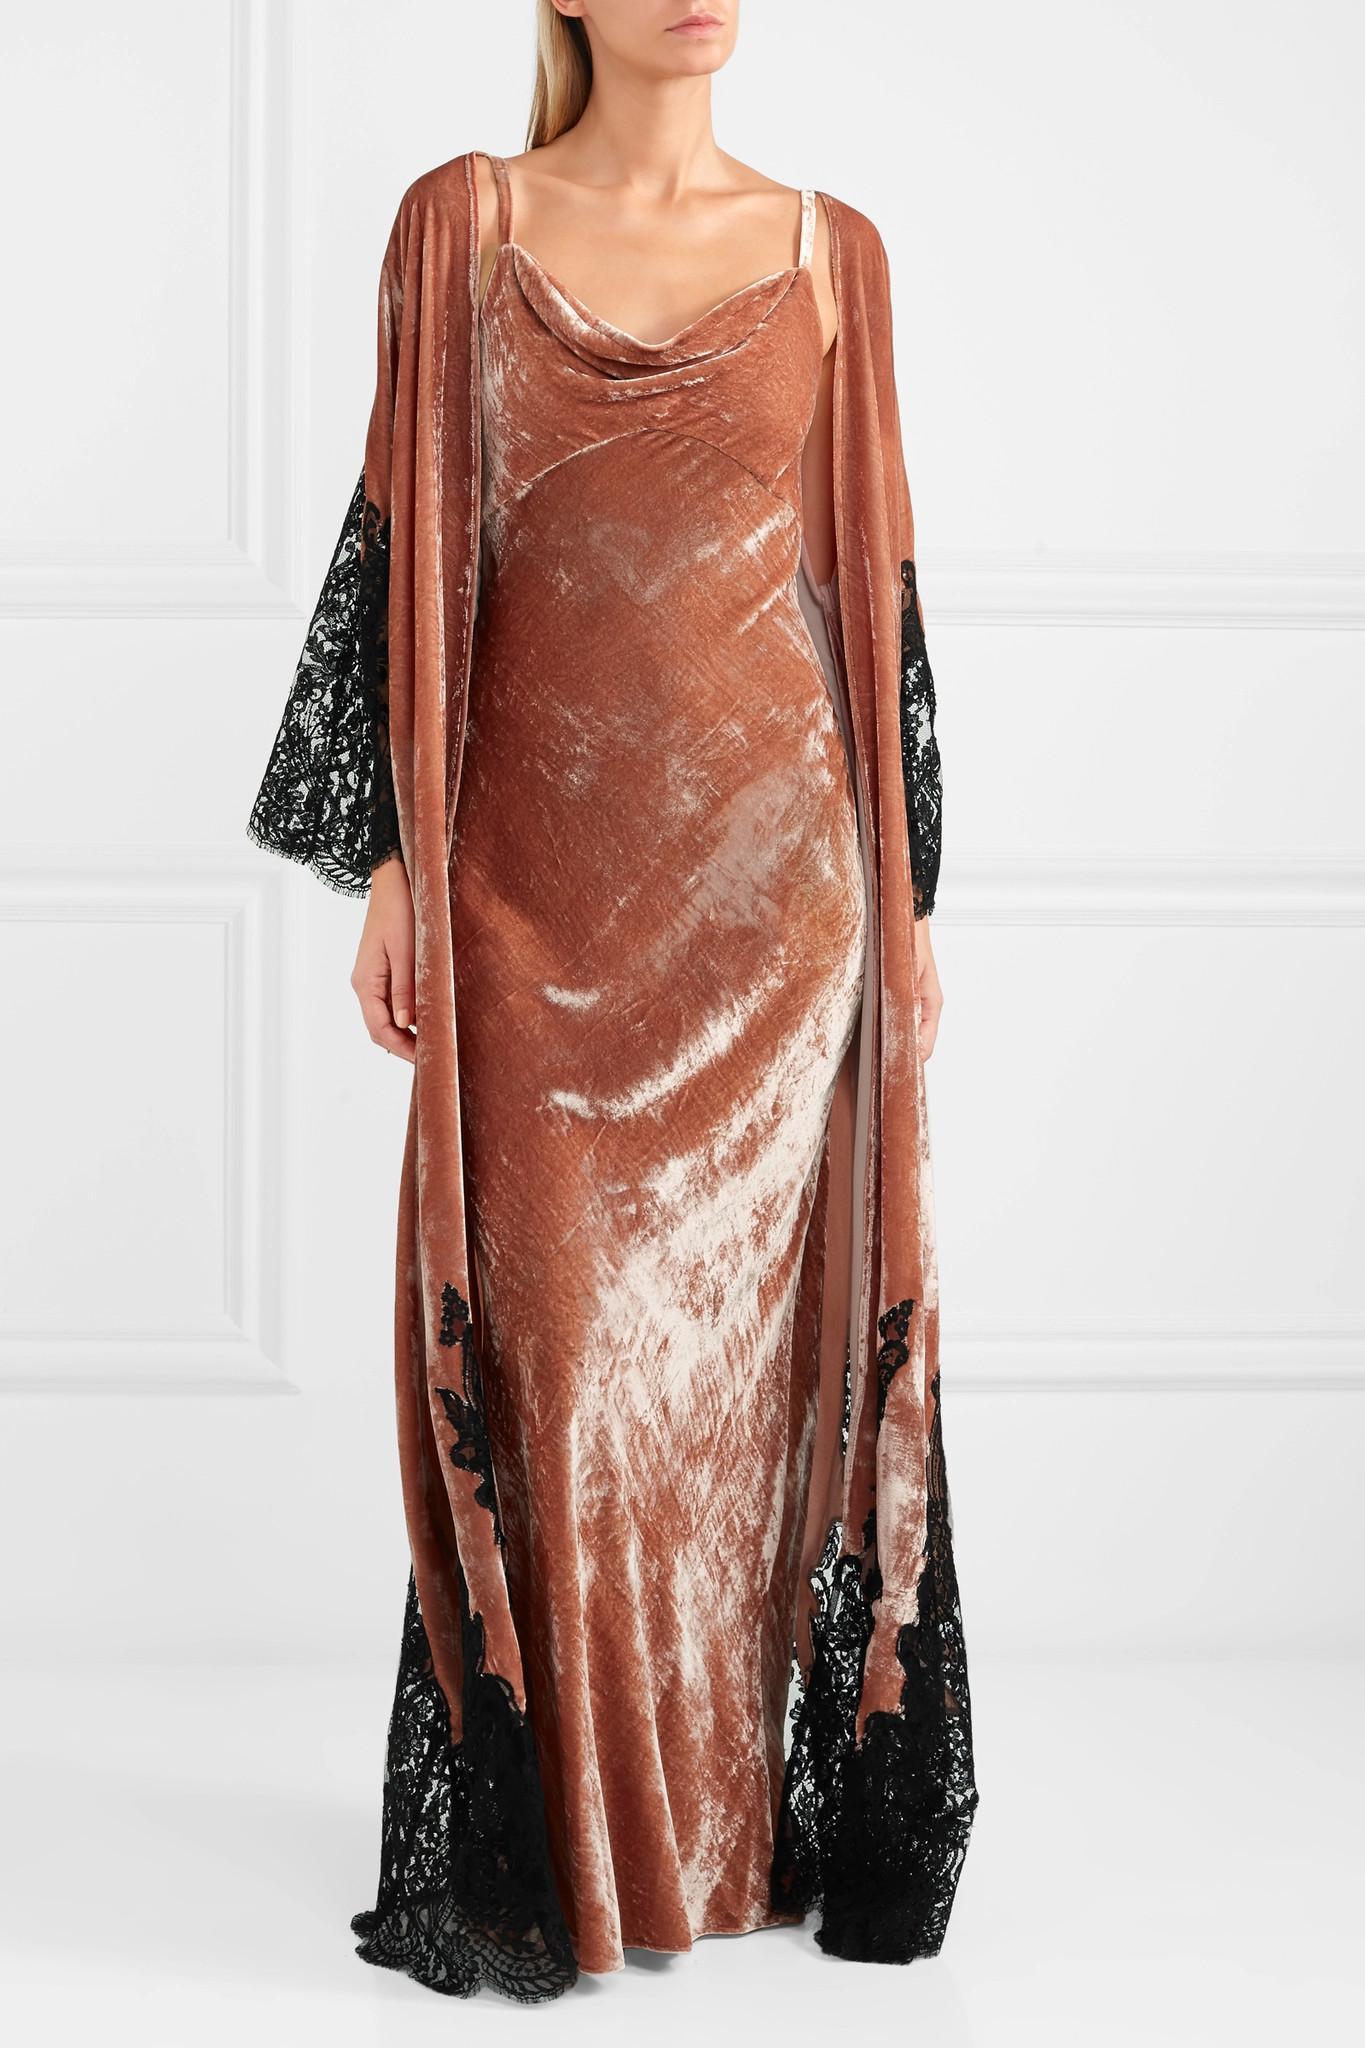 Lyst - Rosamosario Coprimi D amore Lace-paneled Silk-velvet Robe b73341287